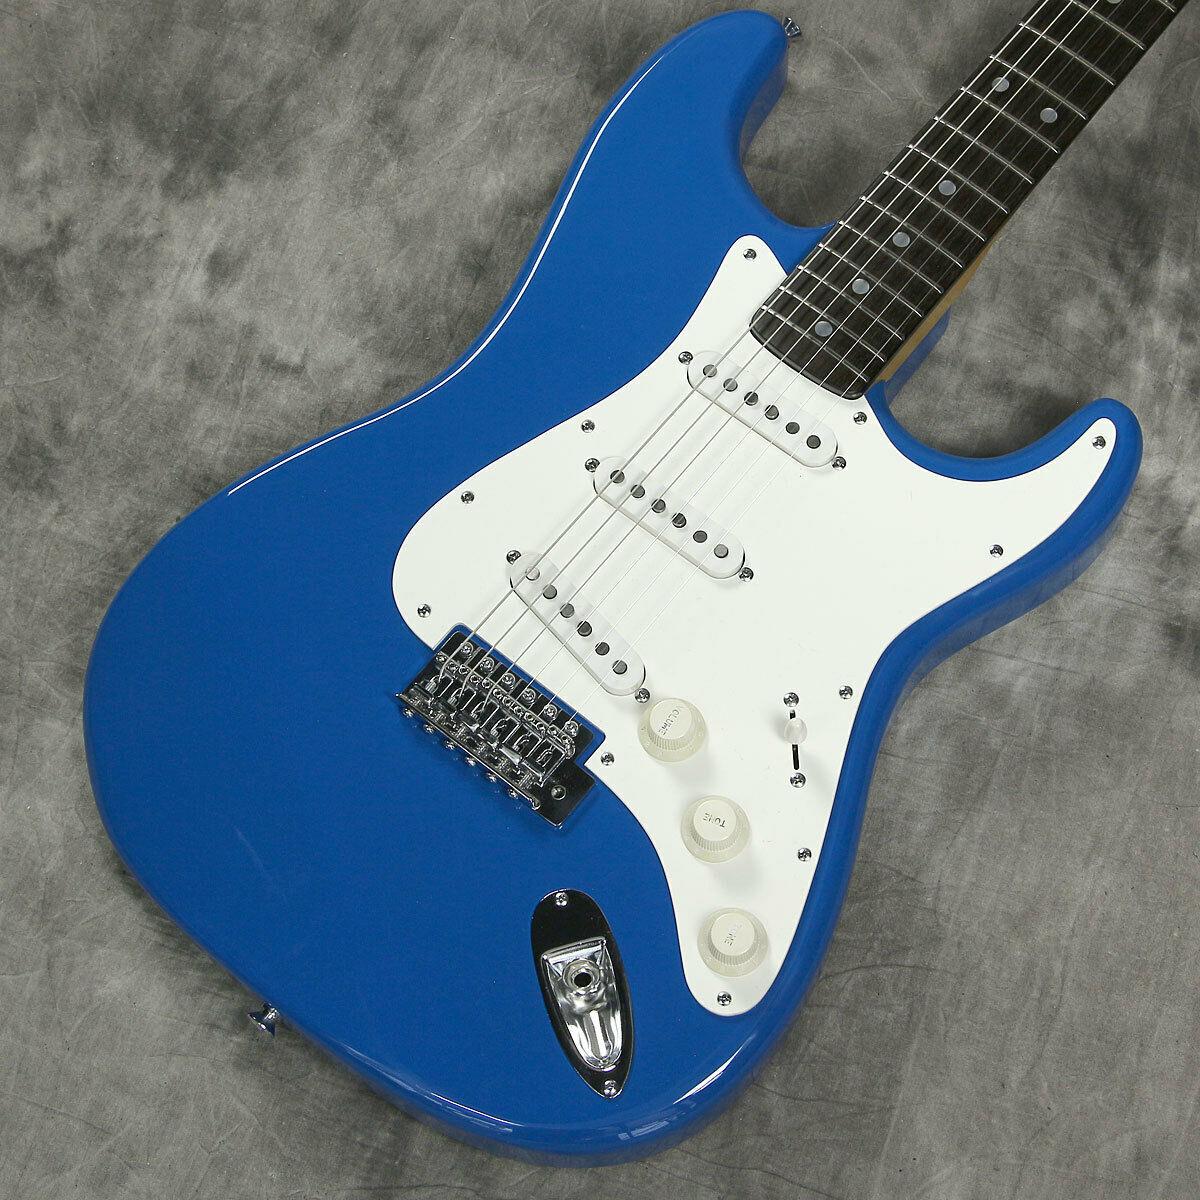 YAMAHA SR-400S   Blau Japan Seltene schöne Vintage beliebte EMS F   S